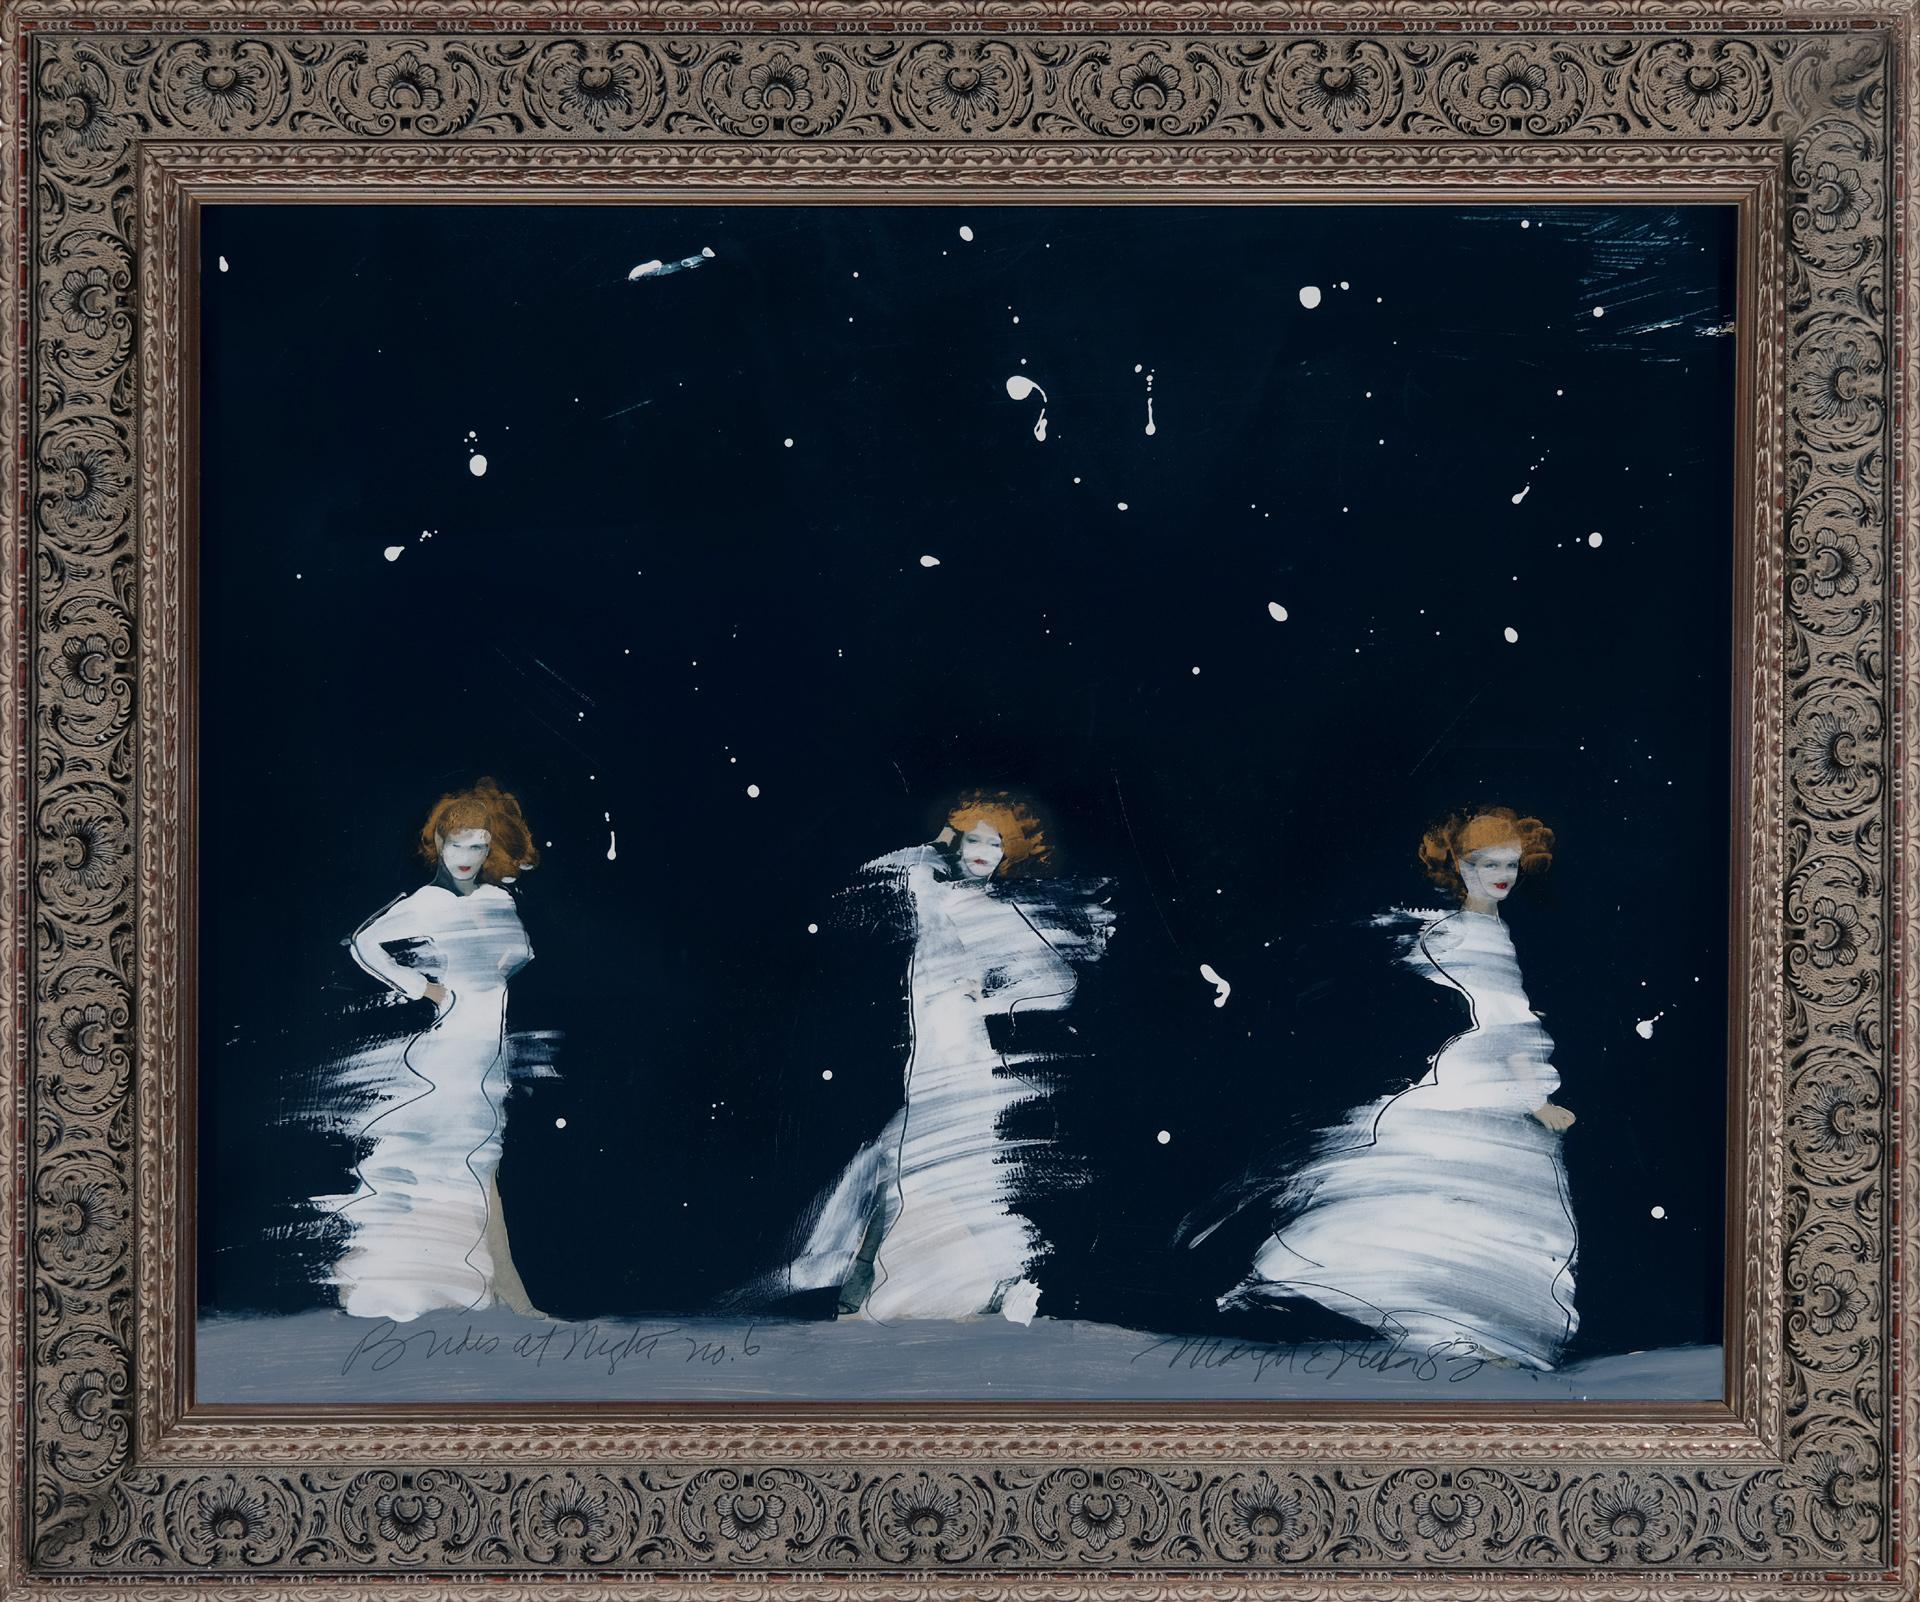 Brides at Night  No. 6, Collage, American Artist, Mixed Media, Dancing,Romance